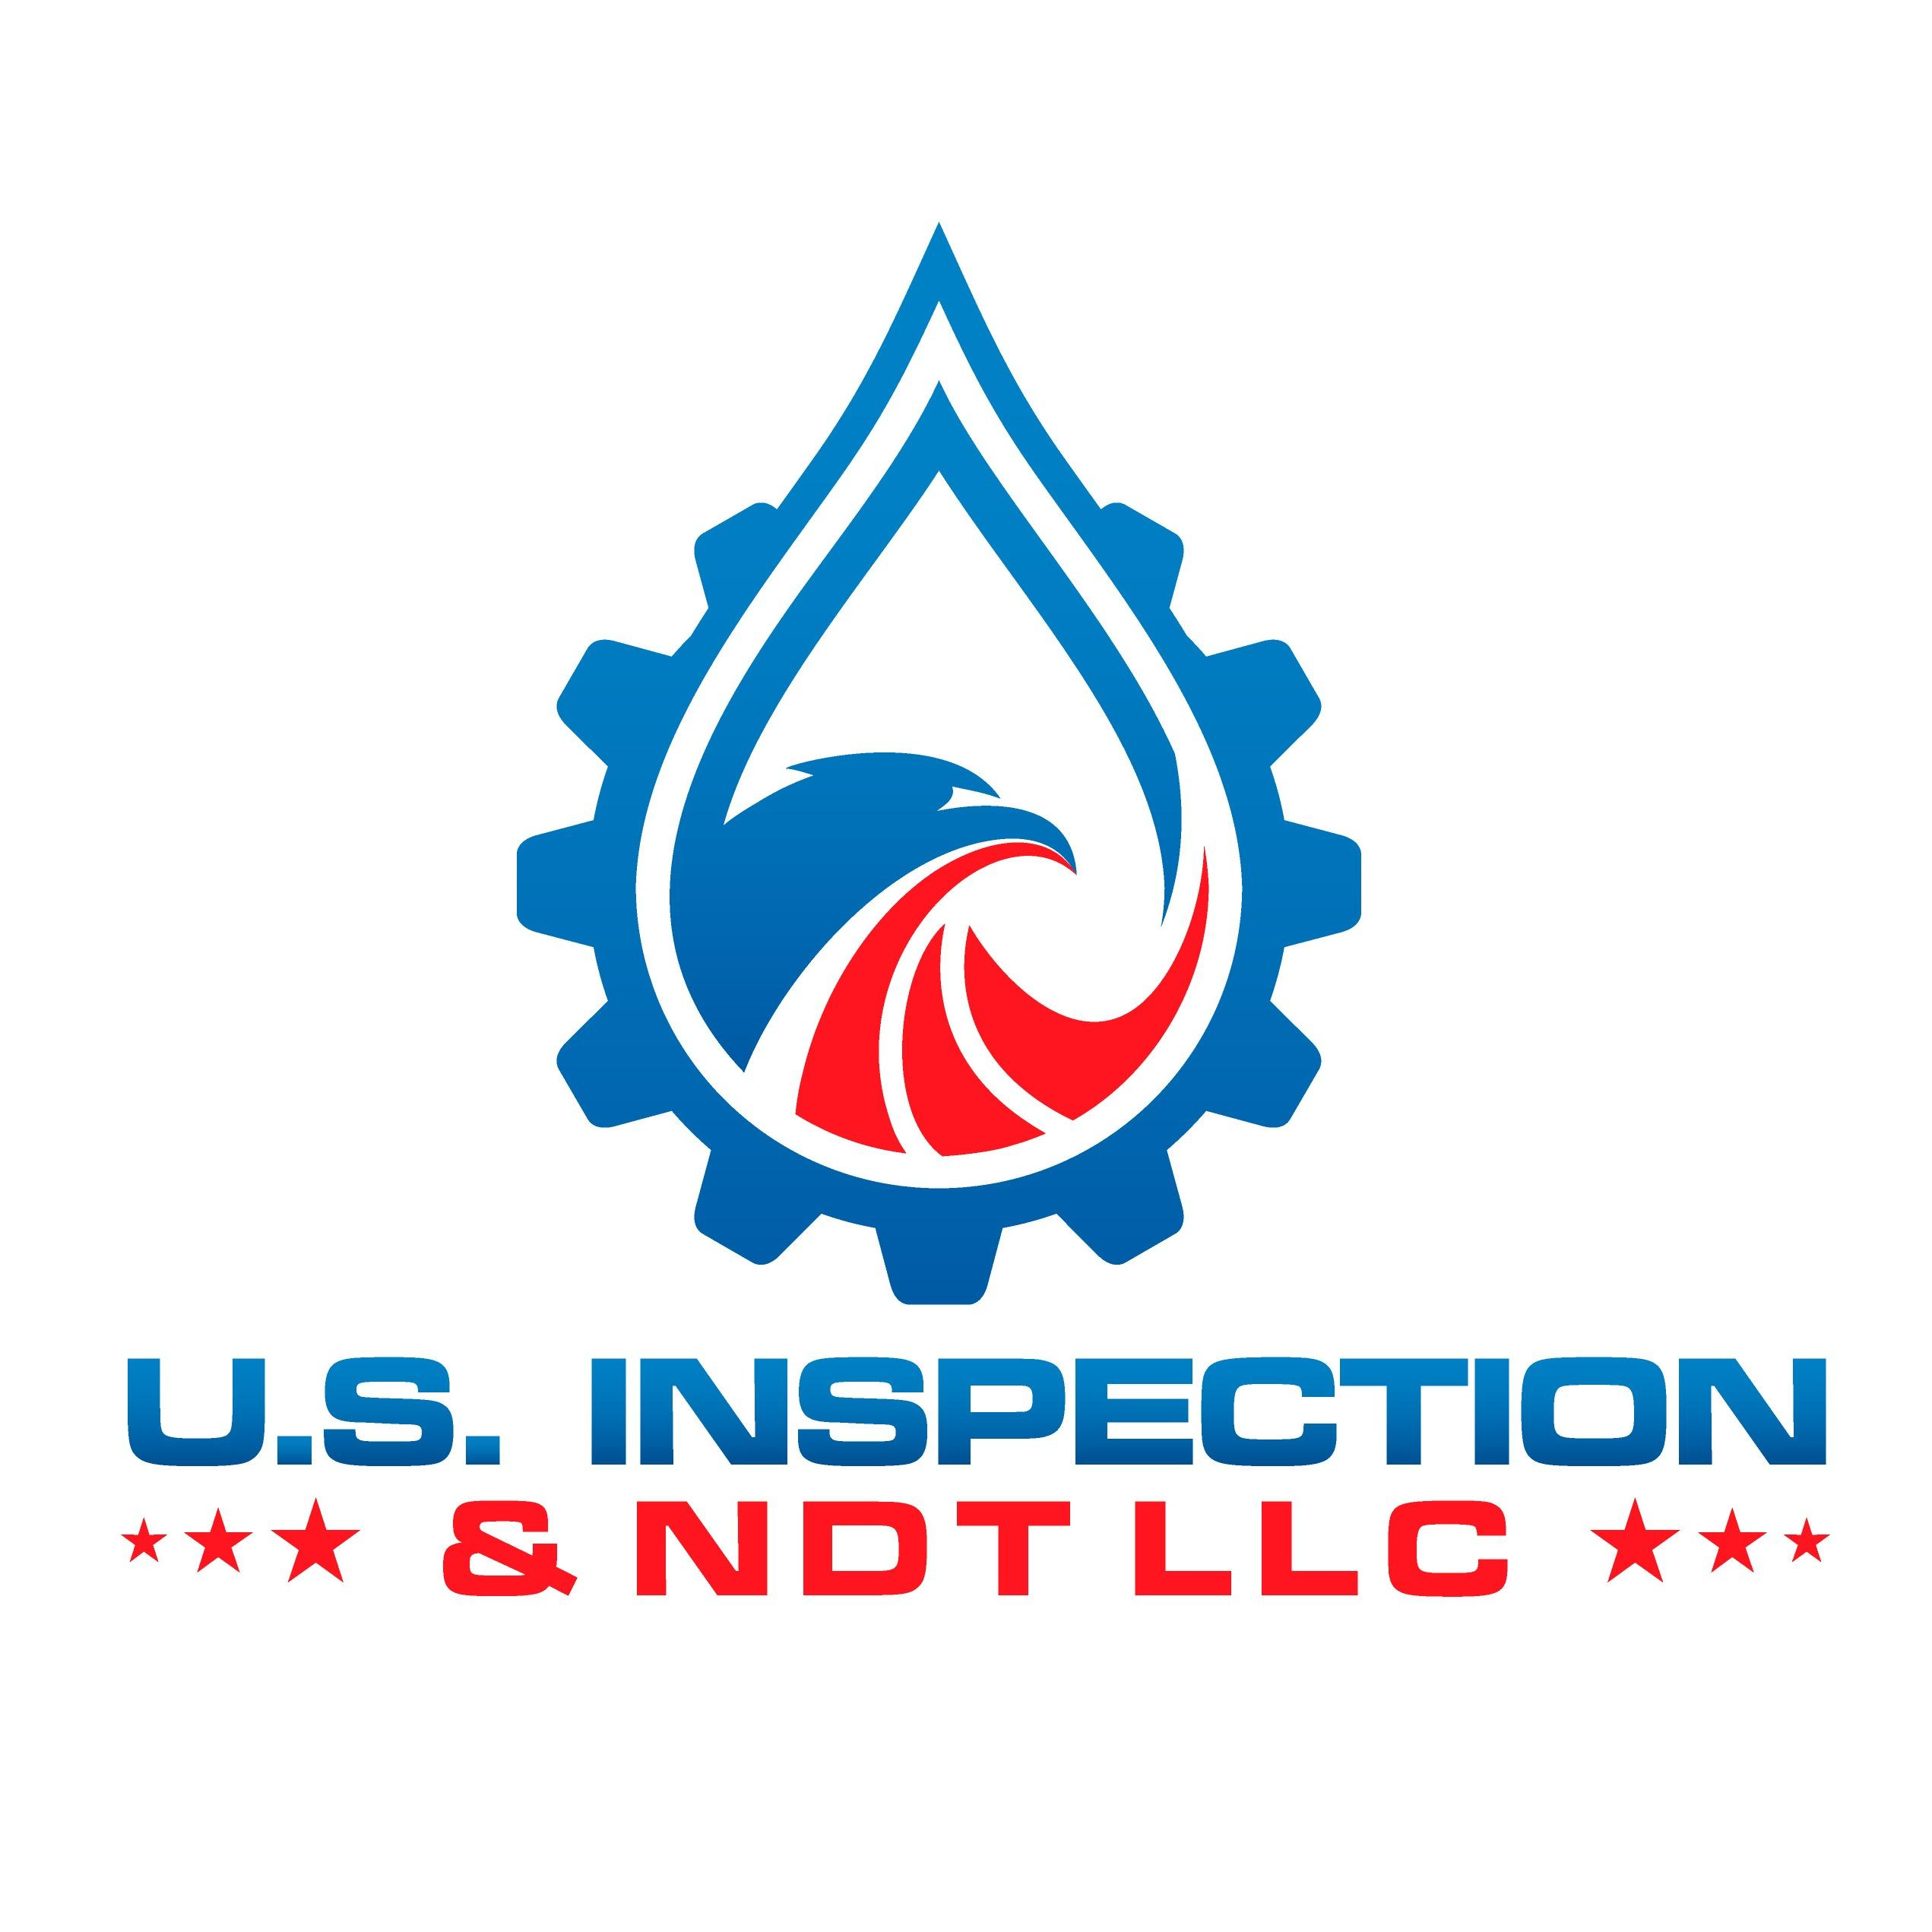 U.S. Inspection & NDT, LLC